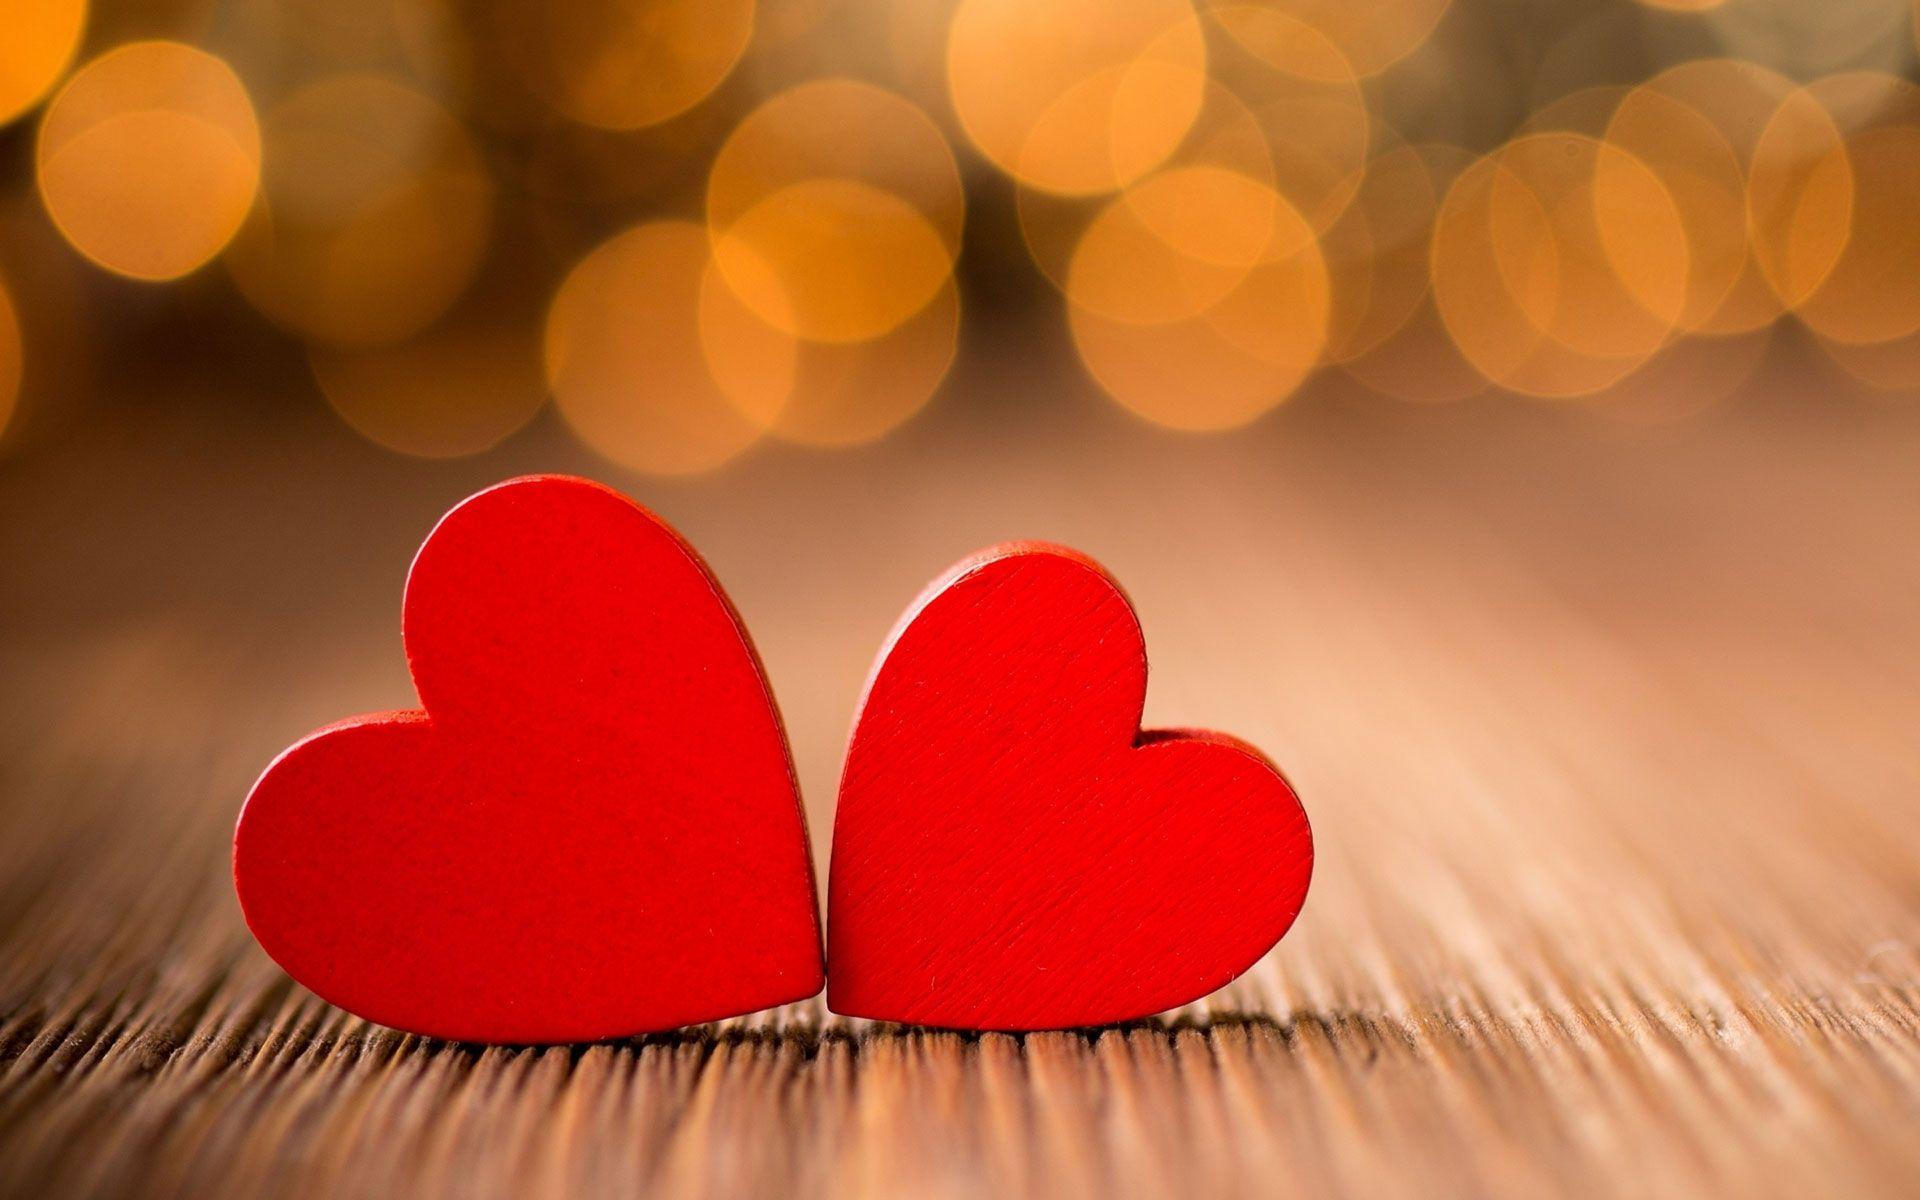 Cute Heart Wallpapers   Top Cute Heart Backgrounds 1920x1200